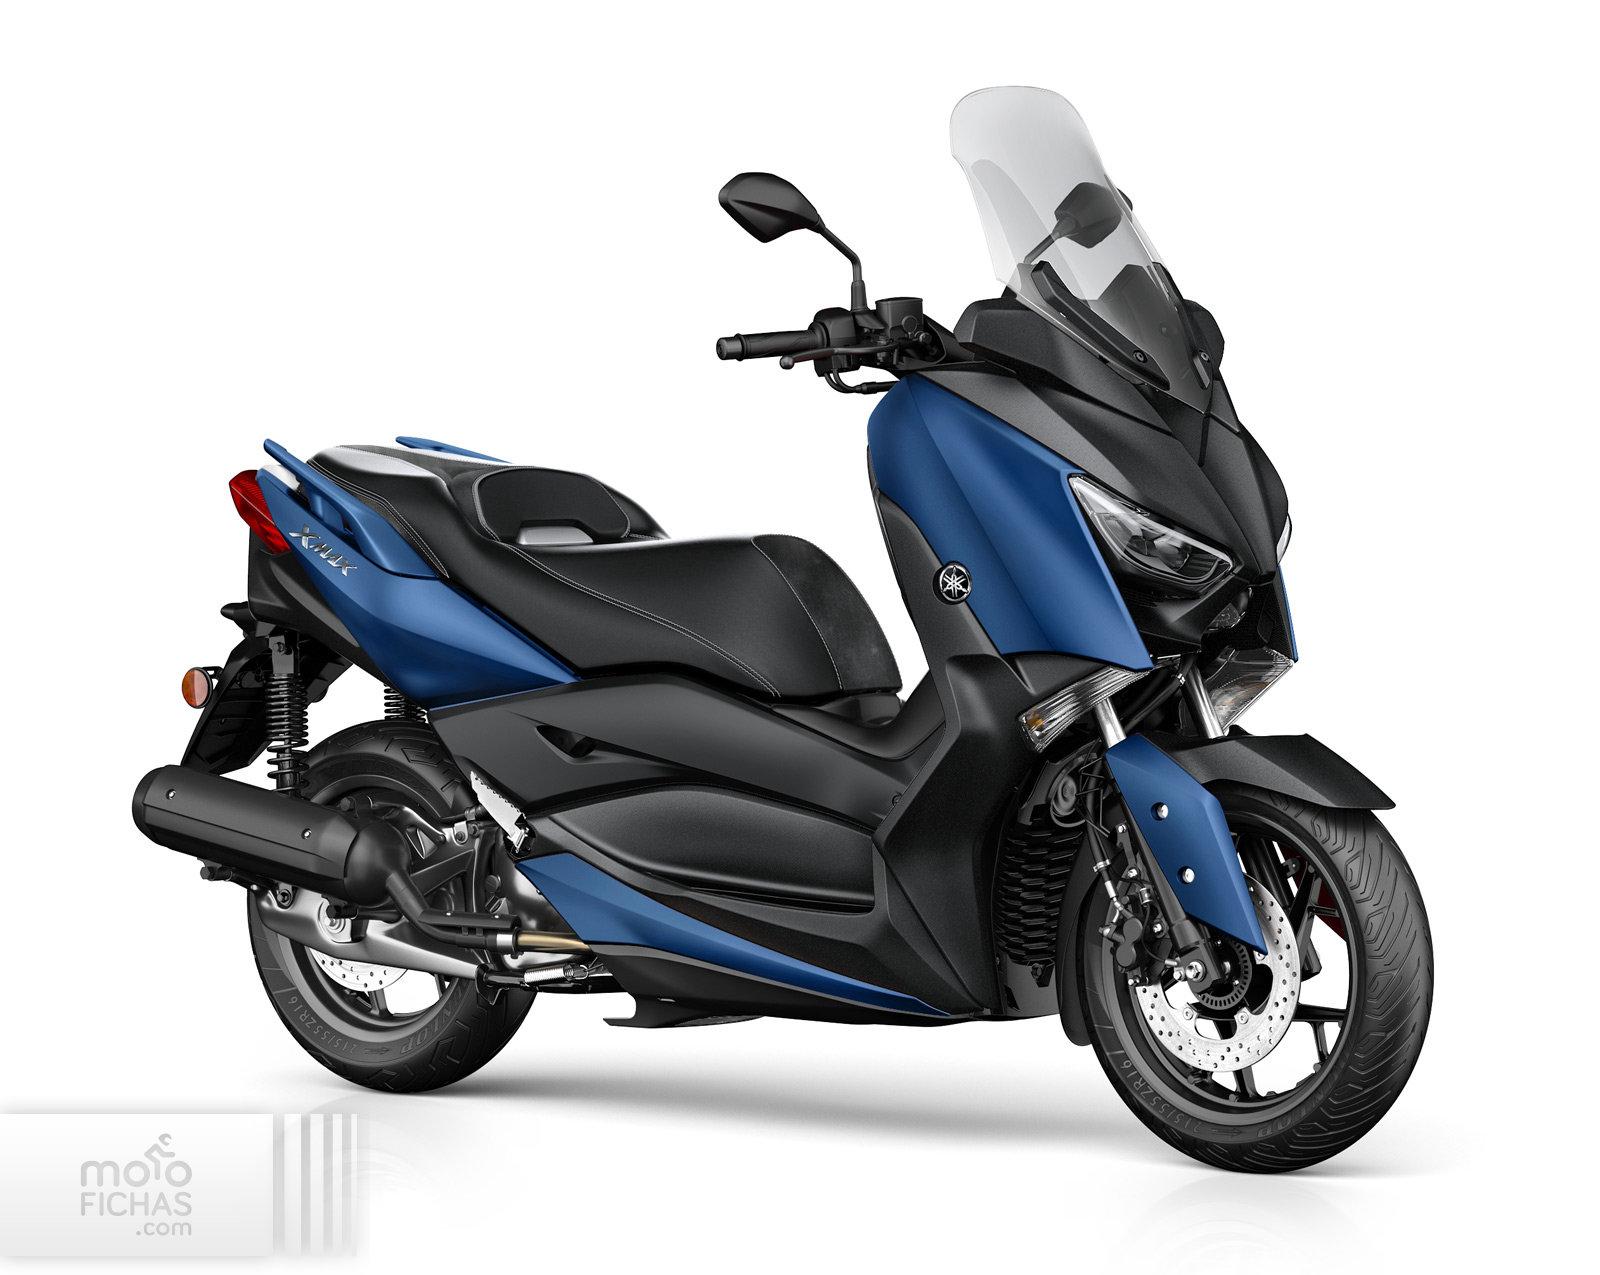 moto yamaha x max 125 precio